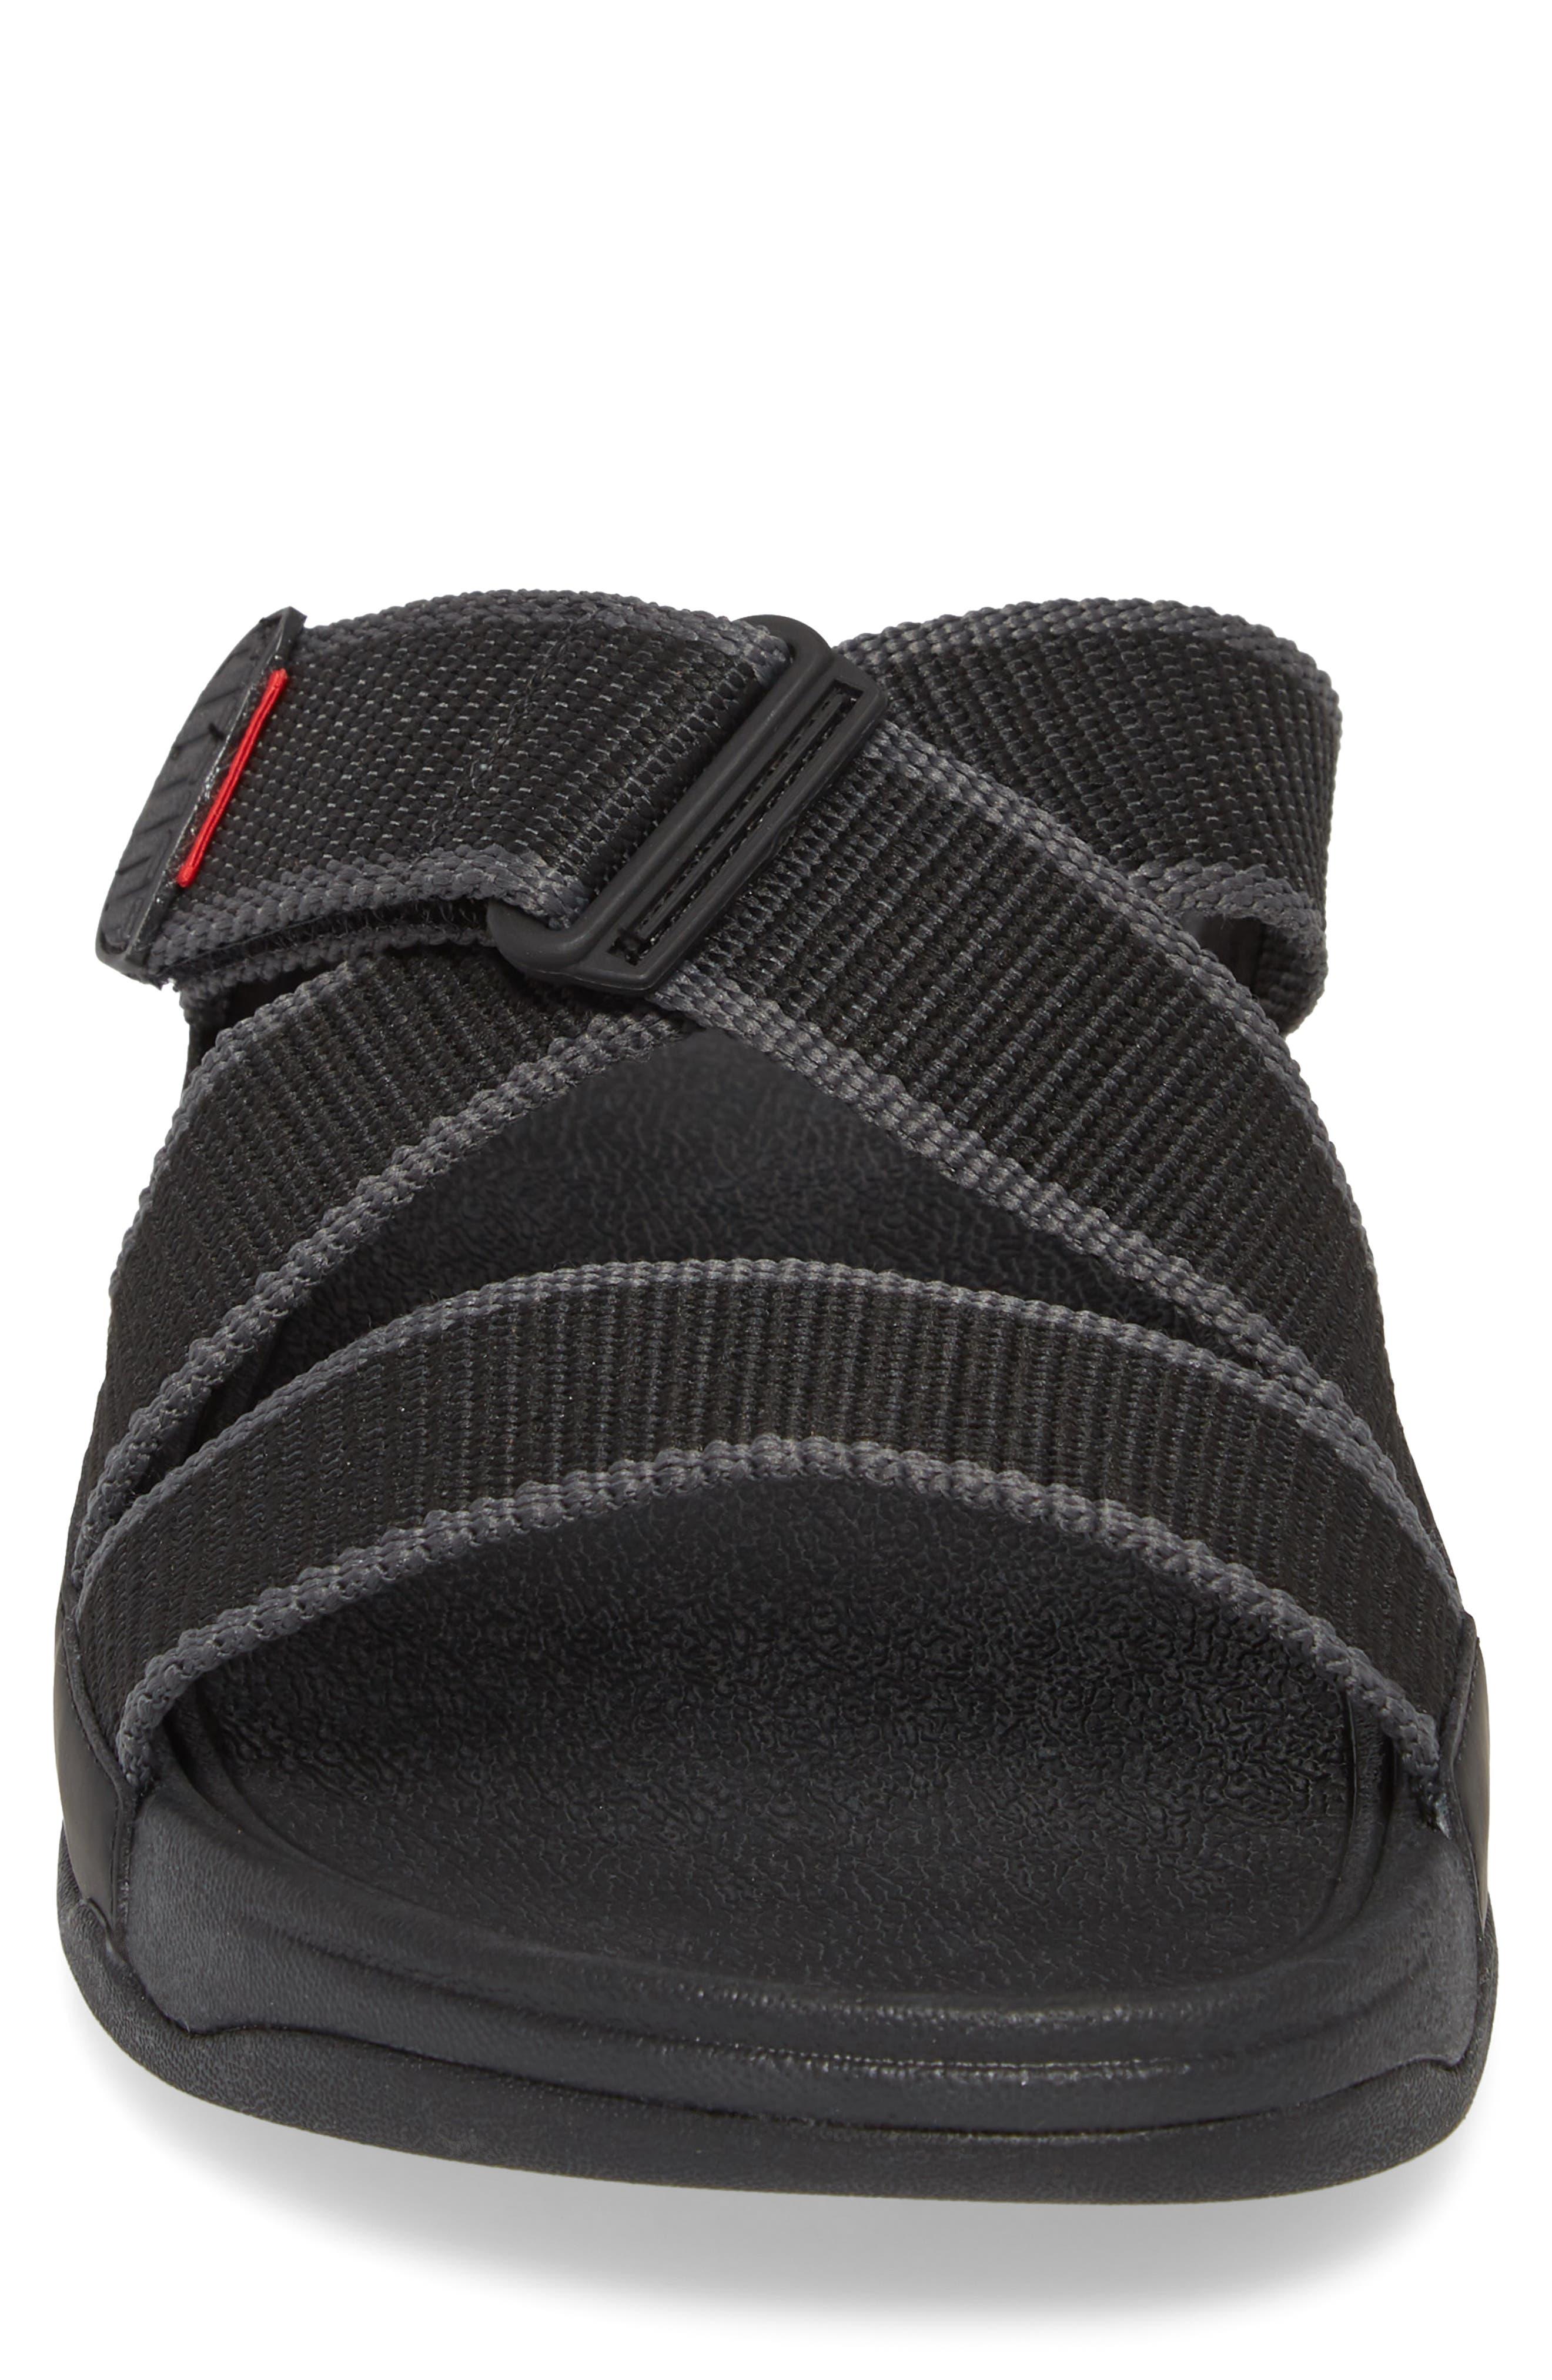 Sling II Slide Sandal,                             Alternate thumbnail 4, color,                             BLACK/ DARK SHADOW